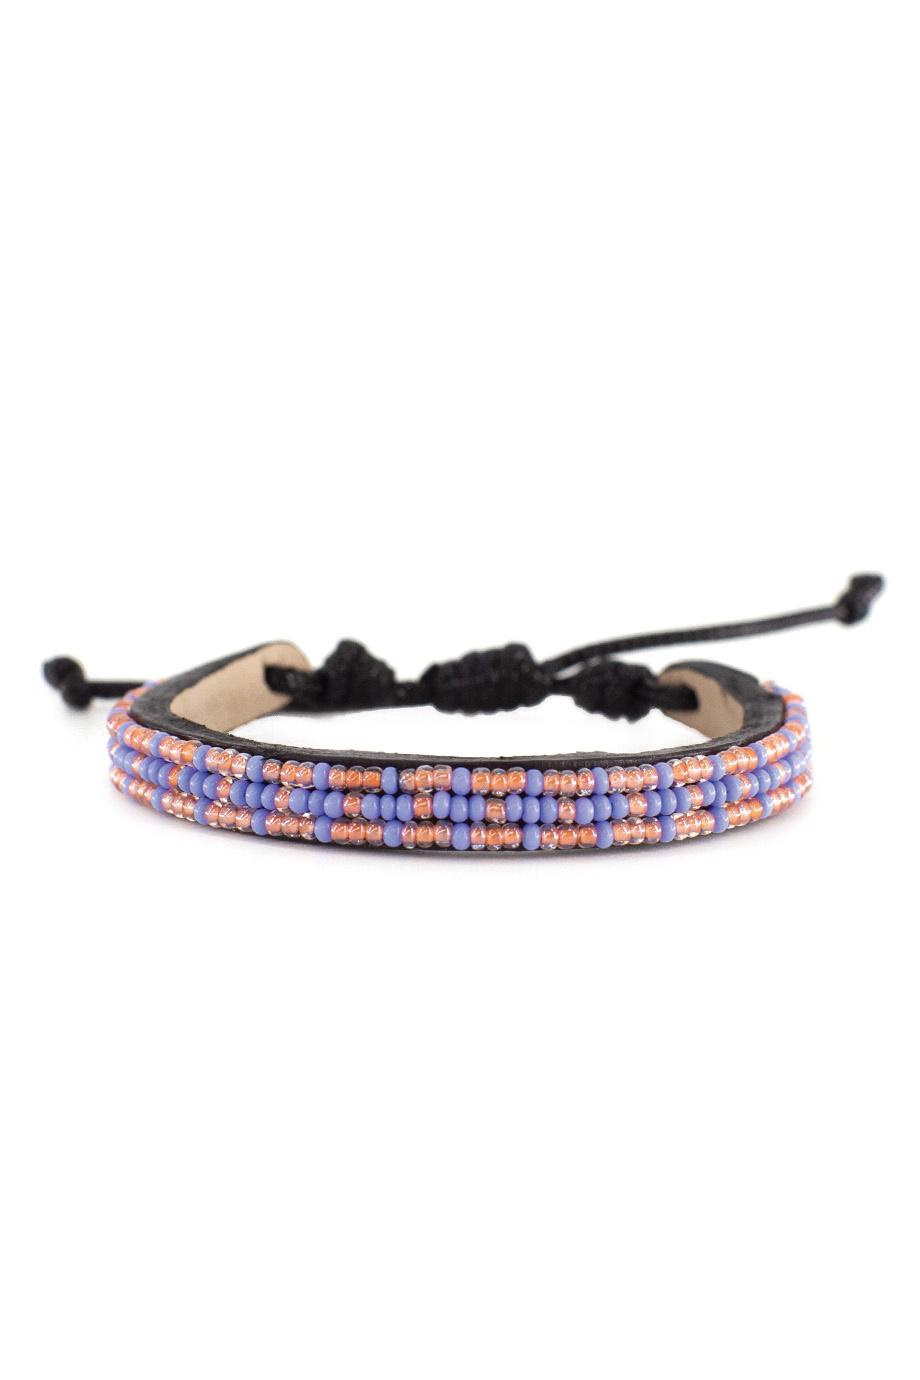 3 row Msalaba Bracelet Pearl/Periwinkle-1